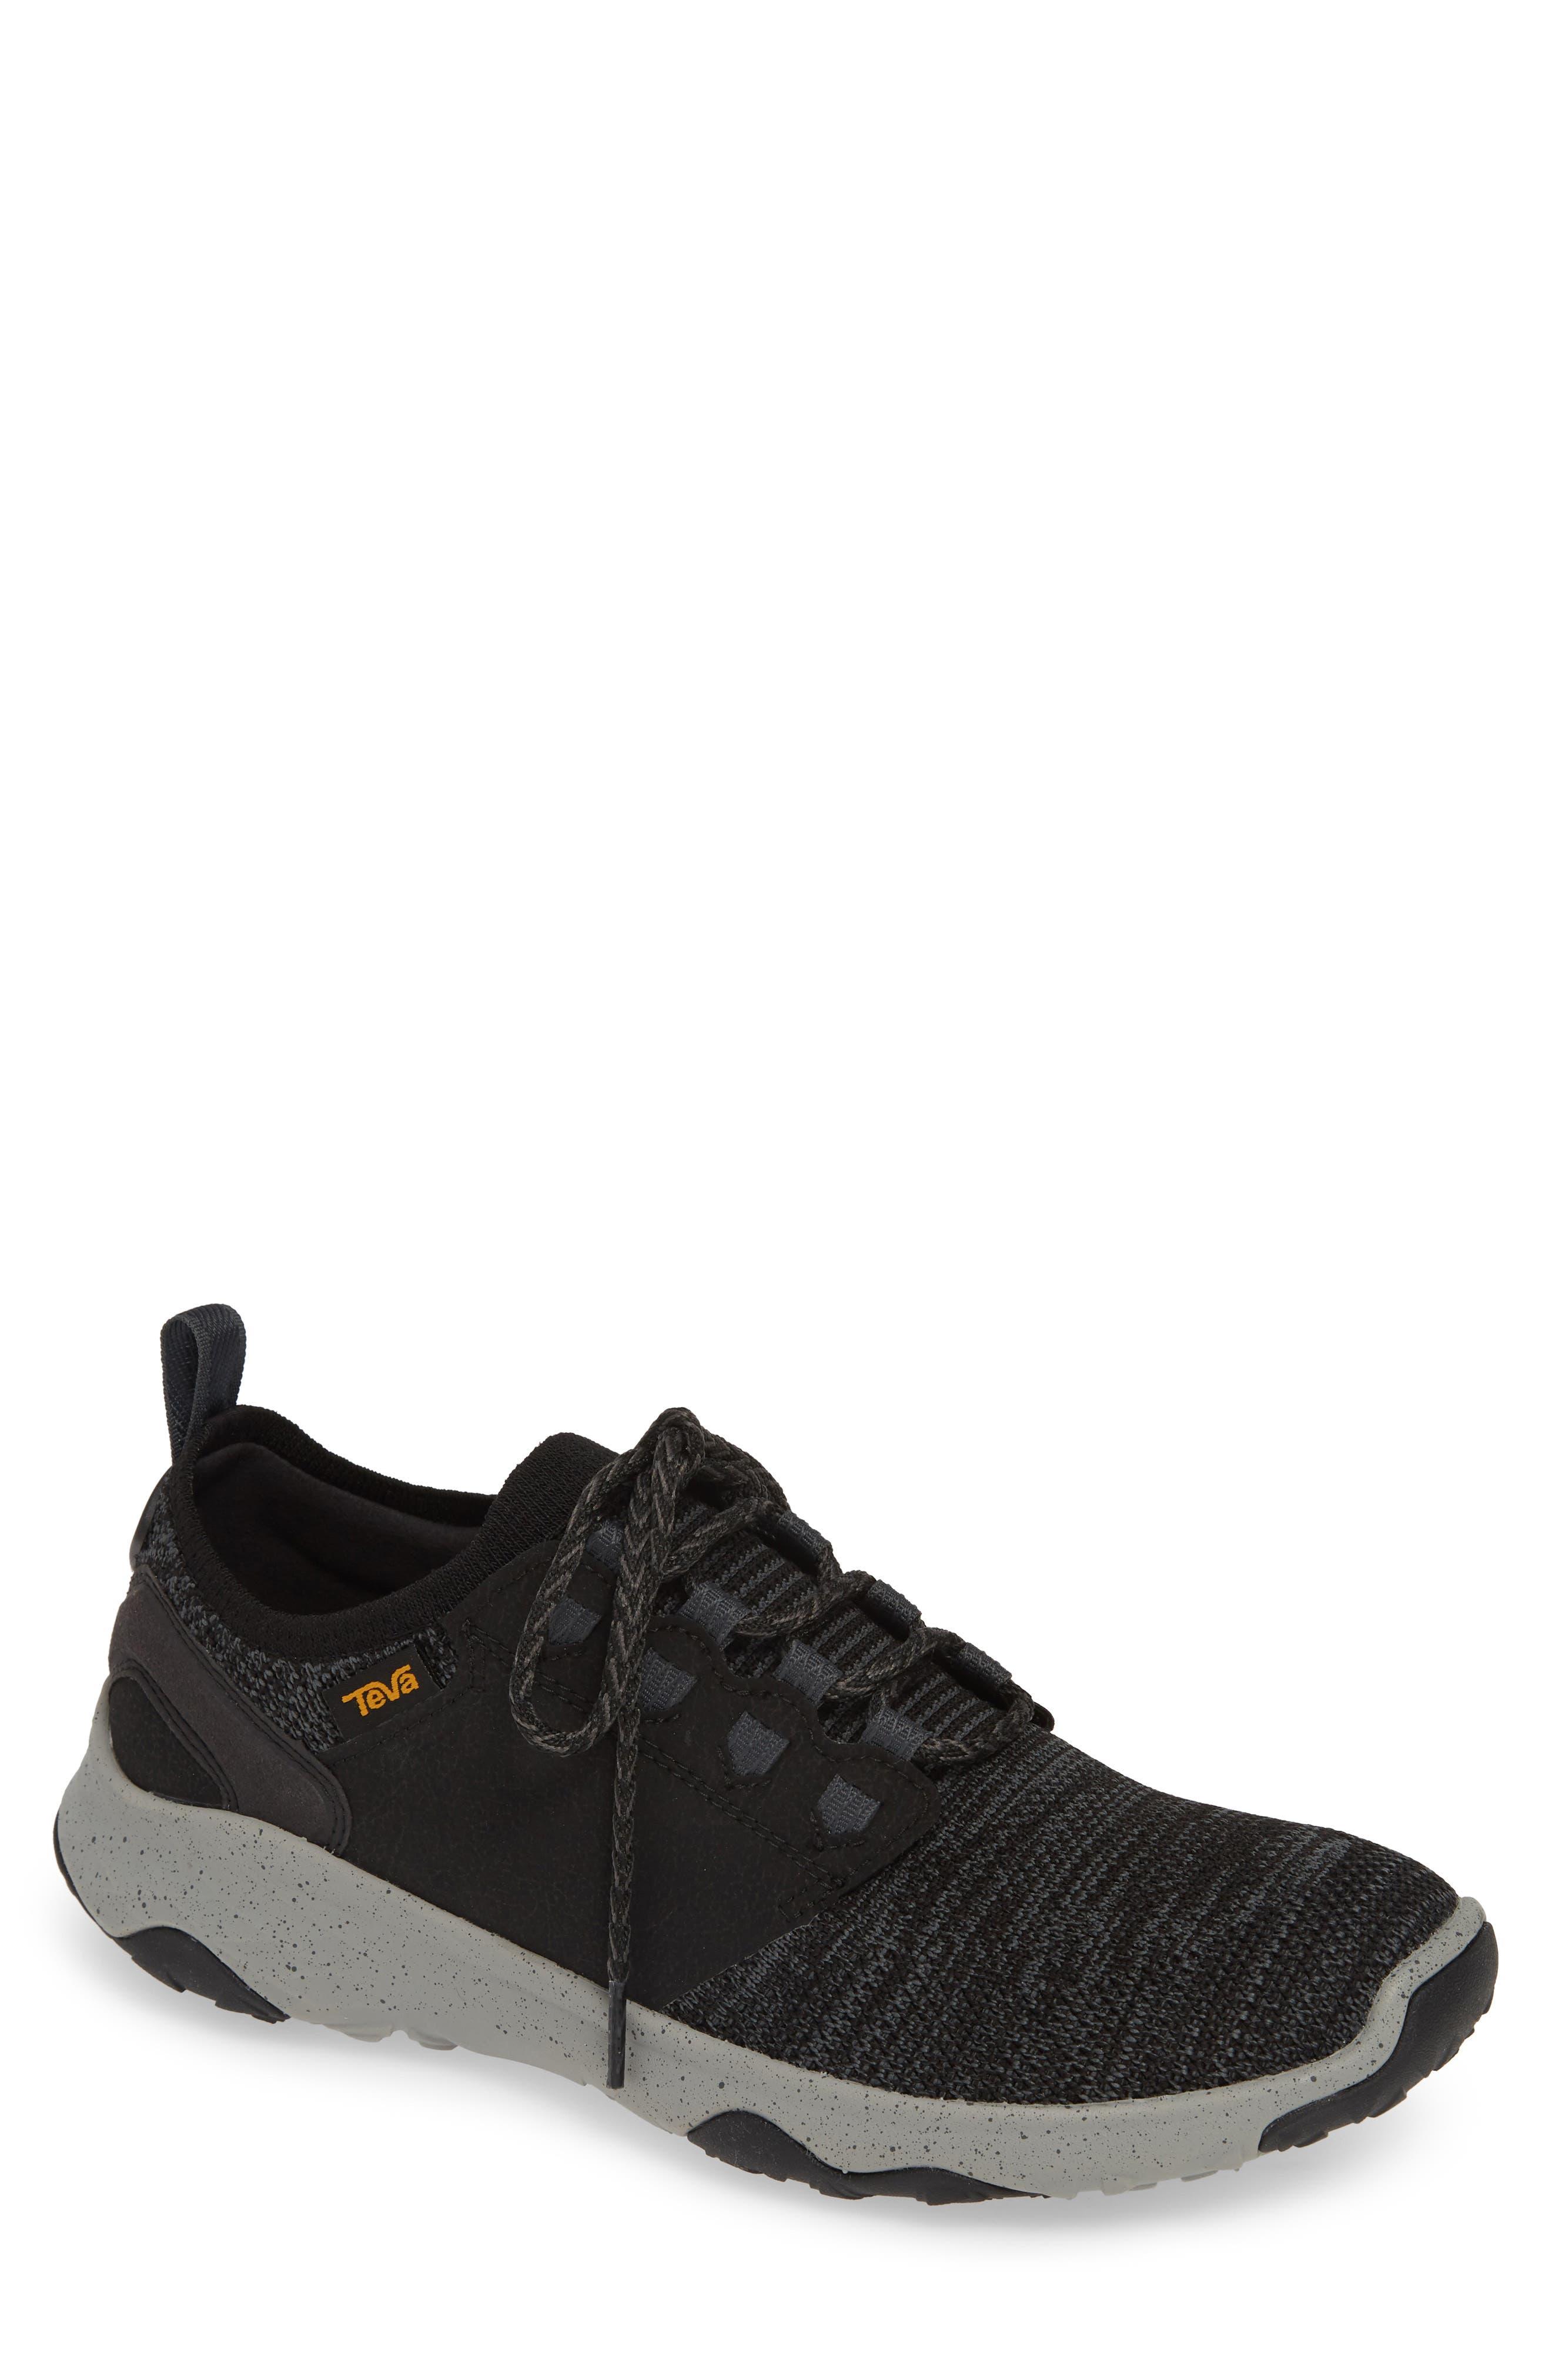 TEVA,                             Arrowood 2 Hiking Shoe,                             Main thumbnail 1, color,                             BLACK